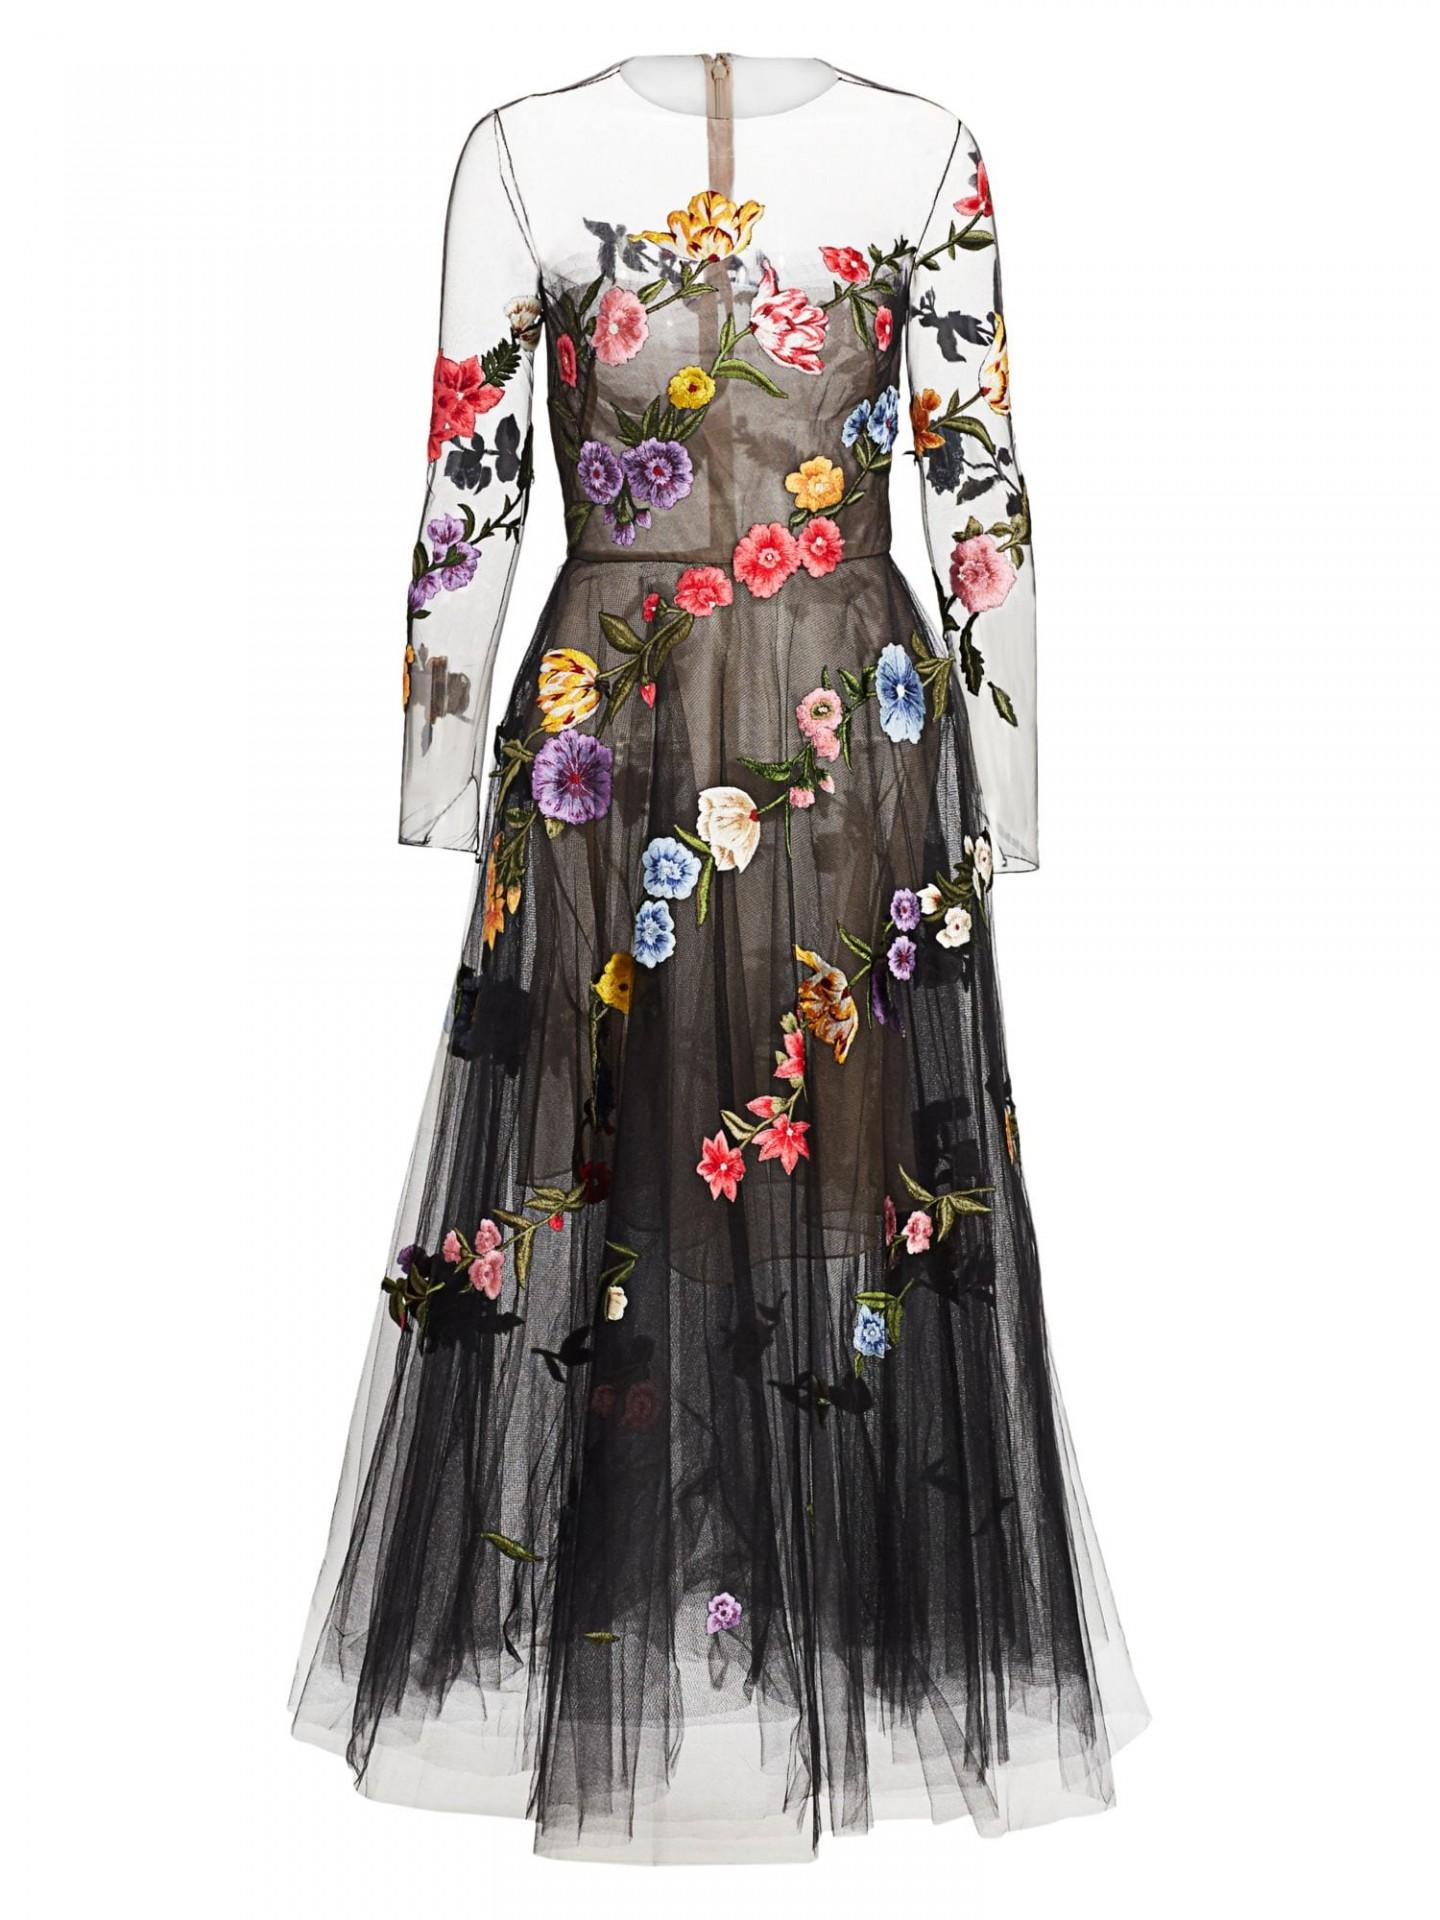 OSCAR DE LA RENTA Garden Fantasy Sheer Cocktail Dress